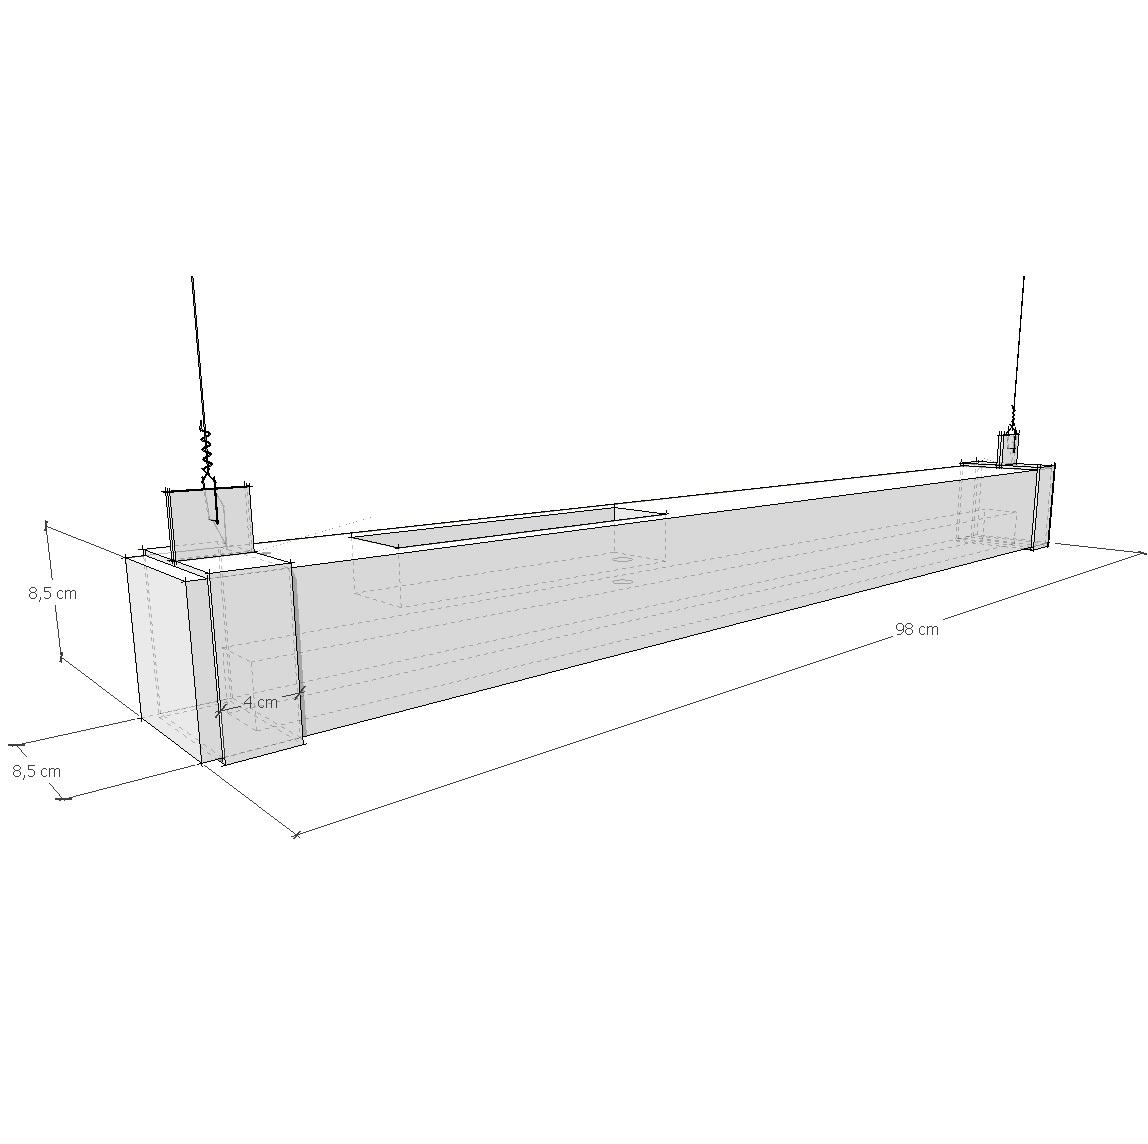 balklamp-woodlight-1-meter-indusigns-amsterdam